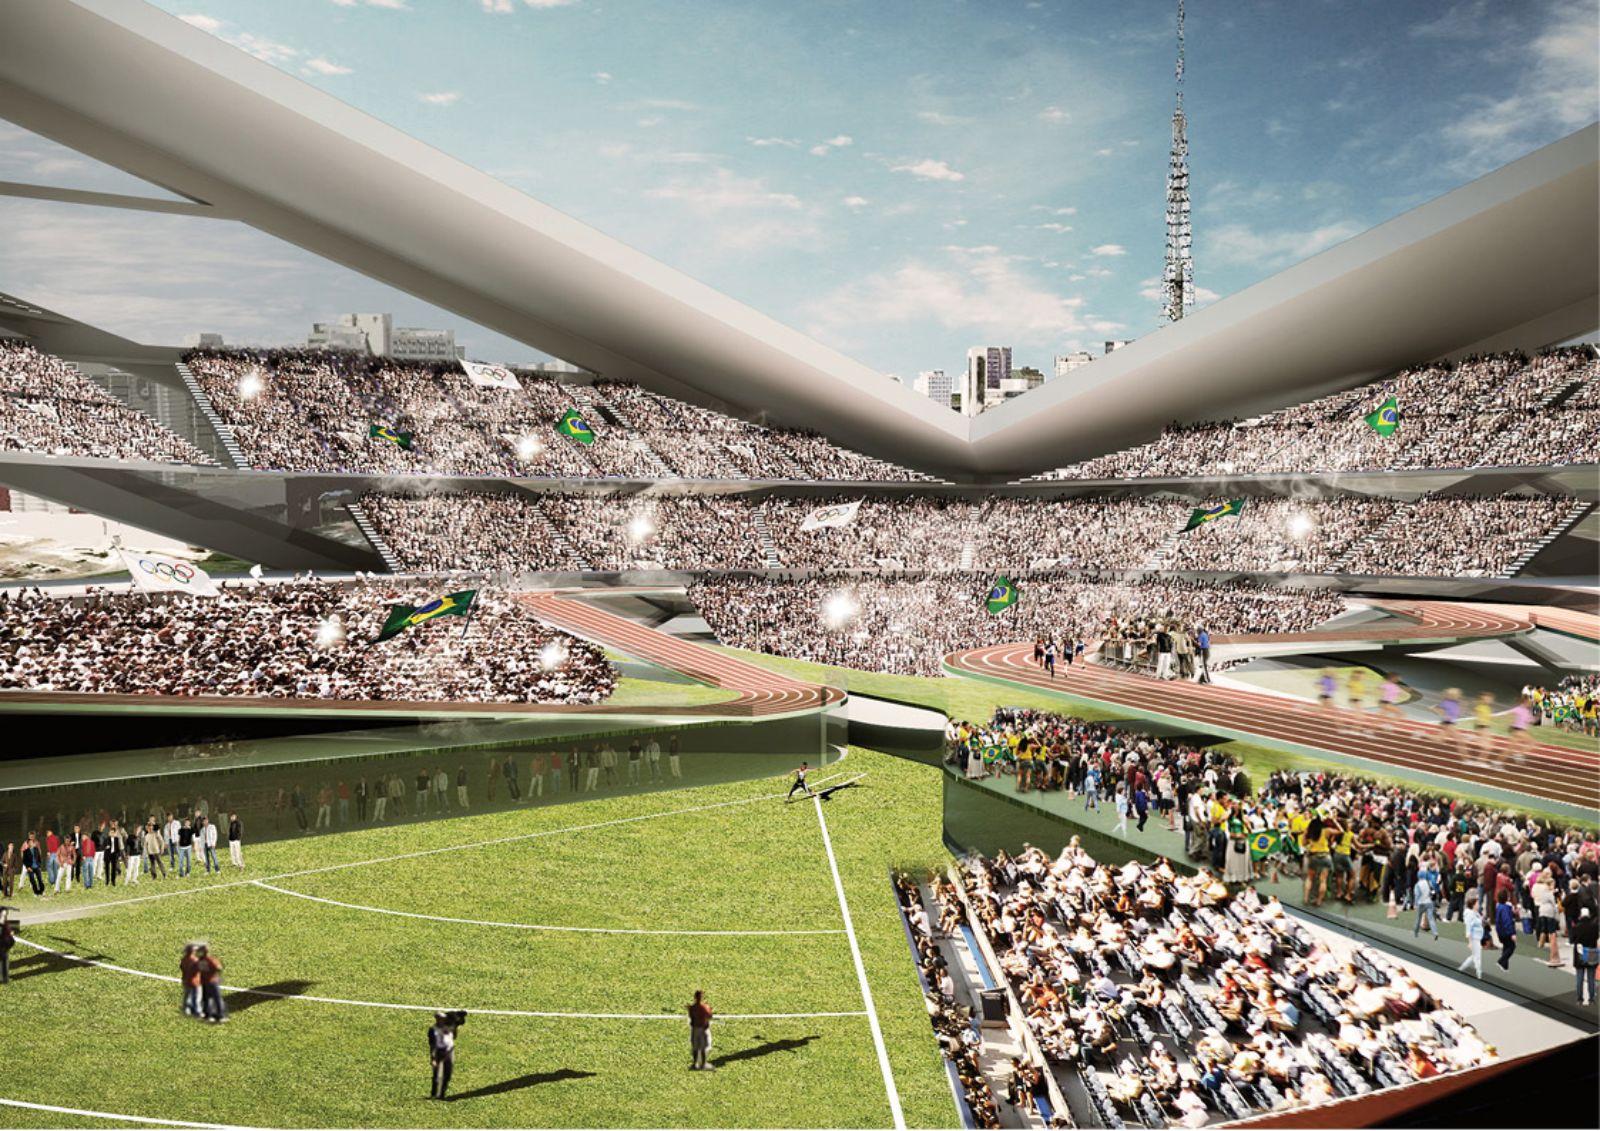 04-Brasilia-atletismo-Estadio-por-BF-arquitectura